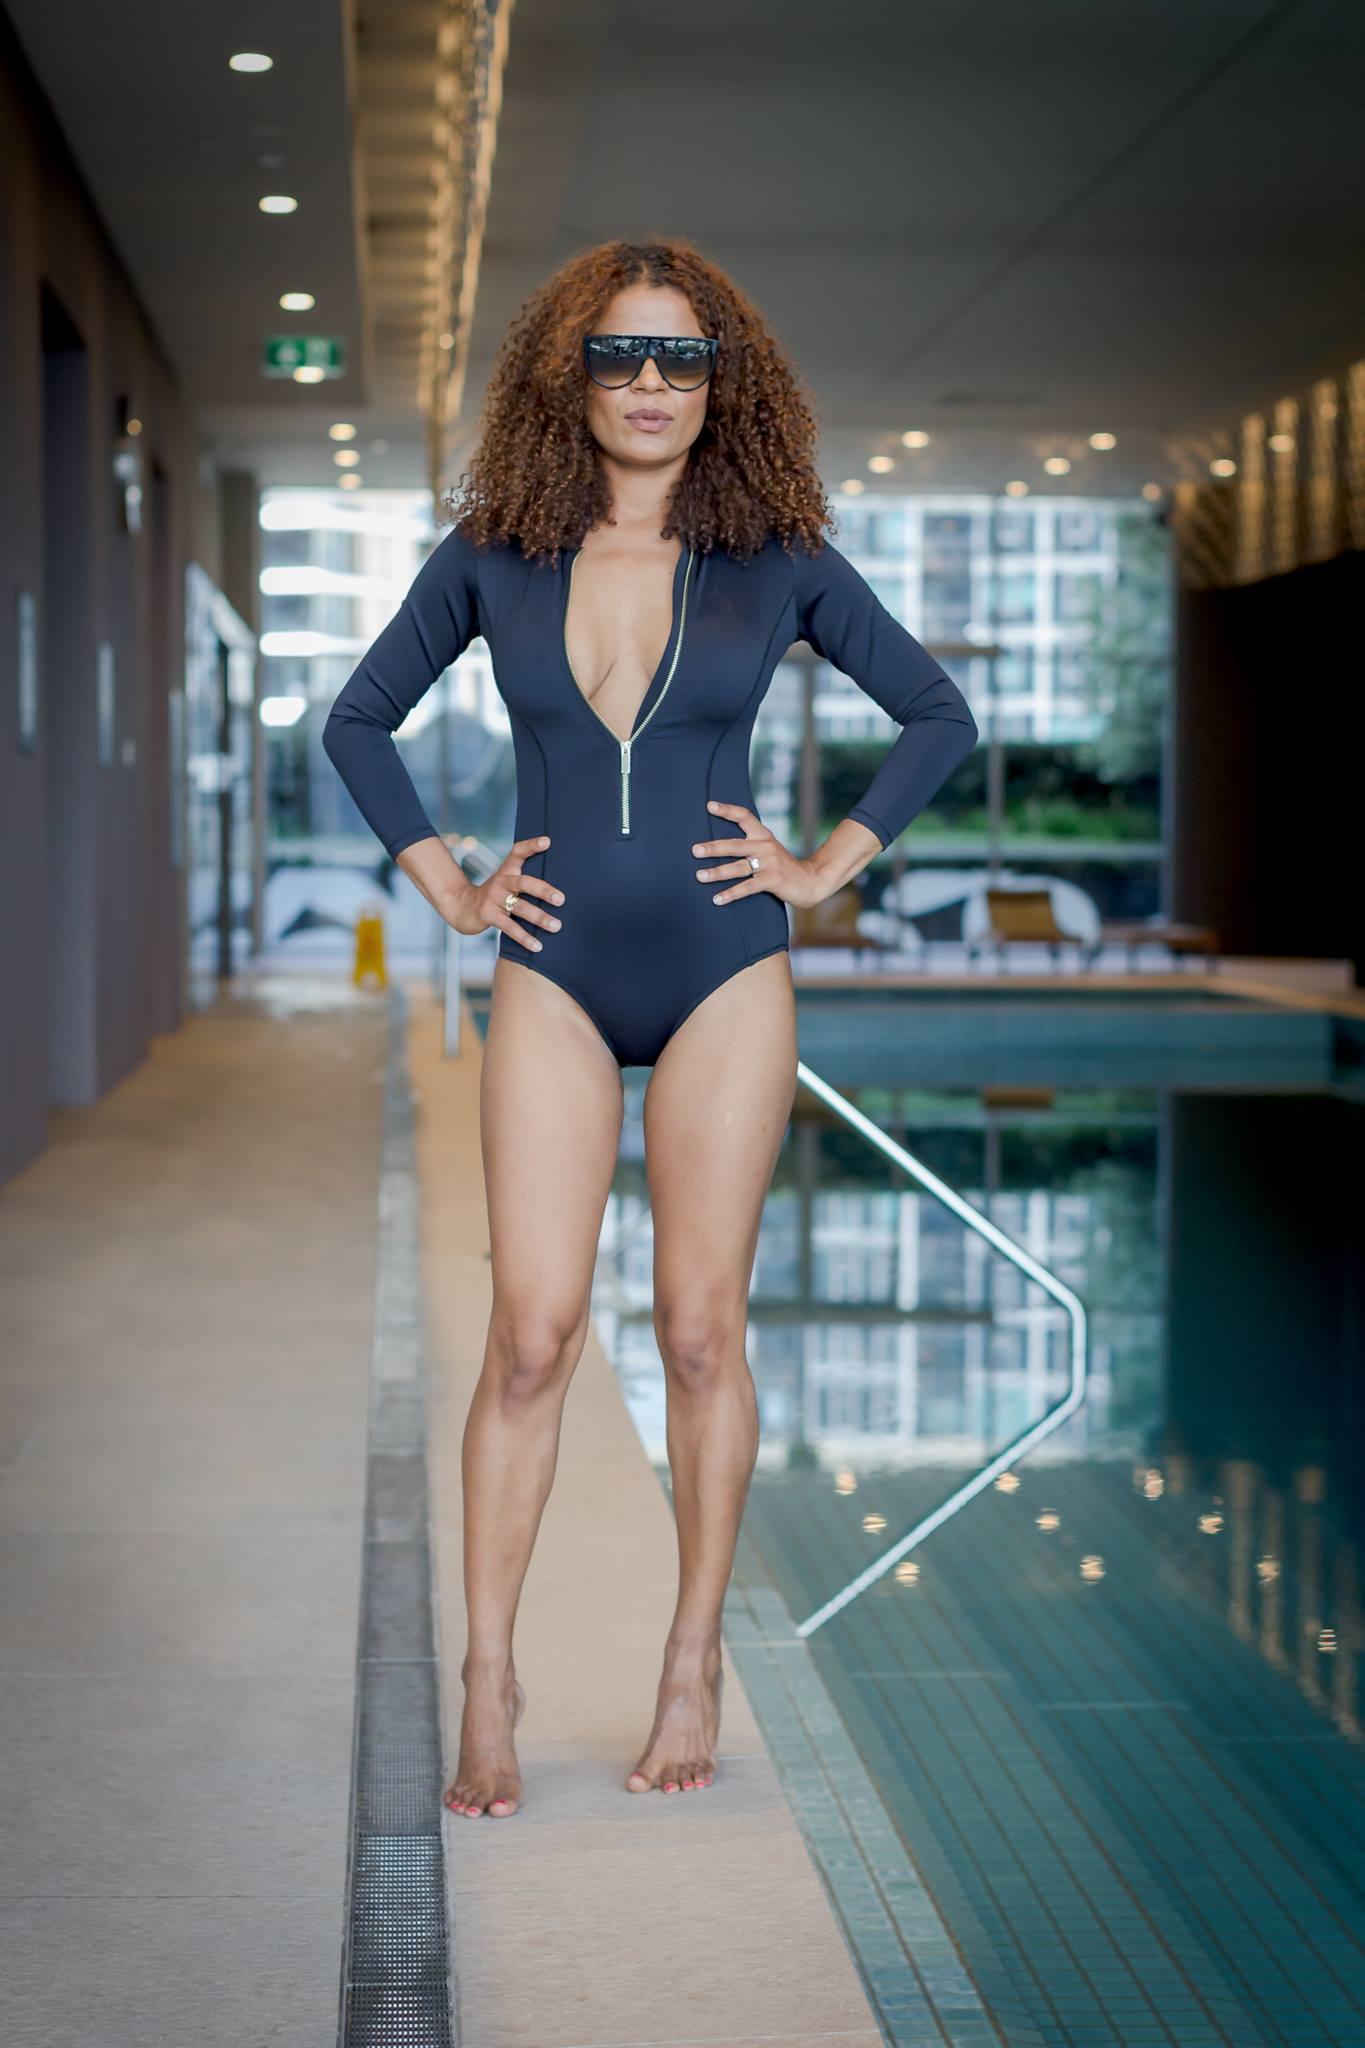 Victoria Latu wearing flattering swimwear